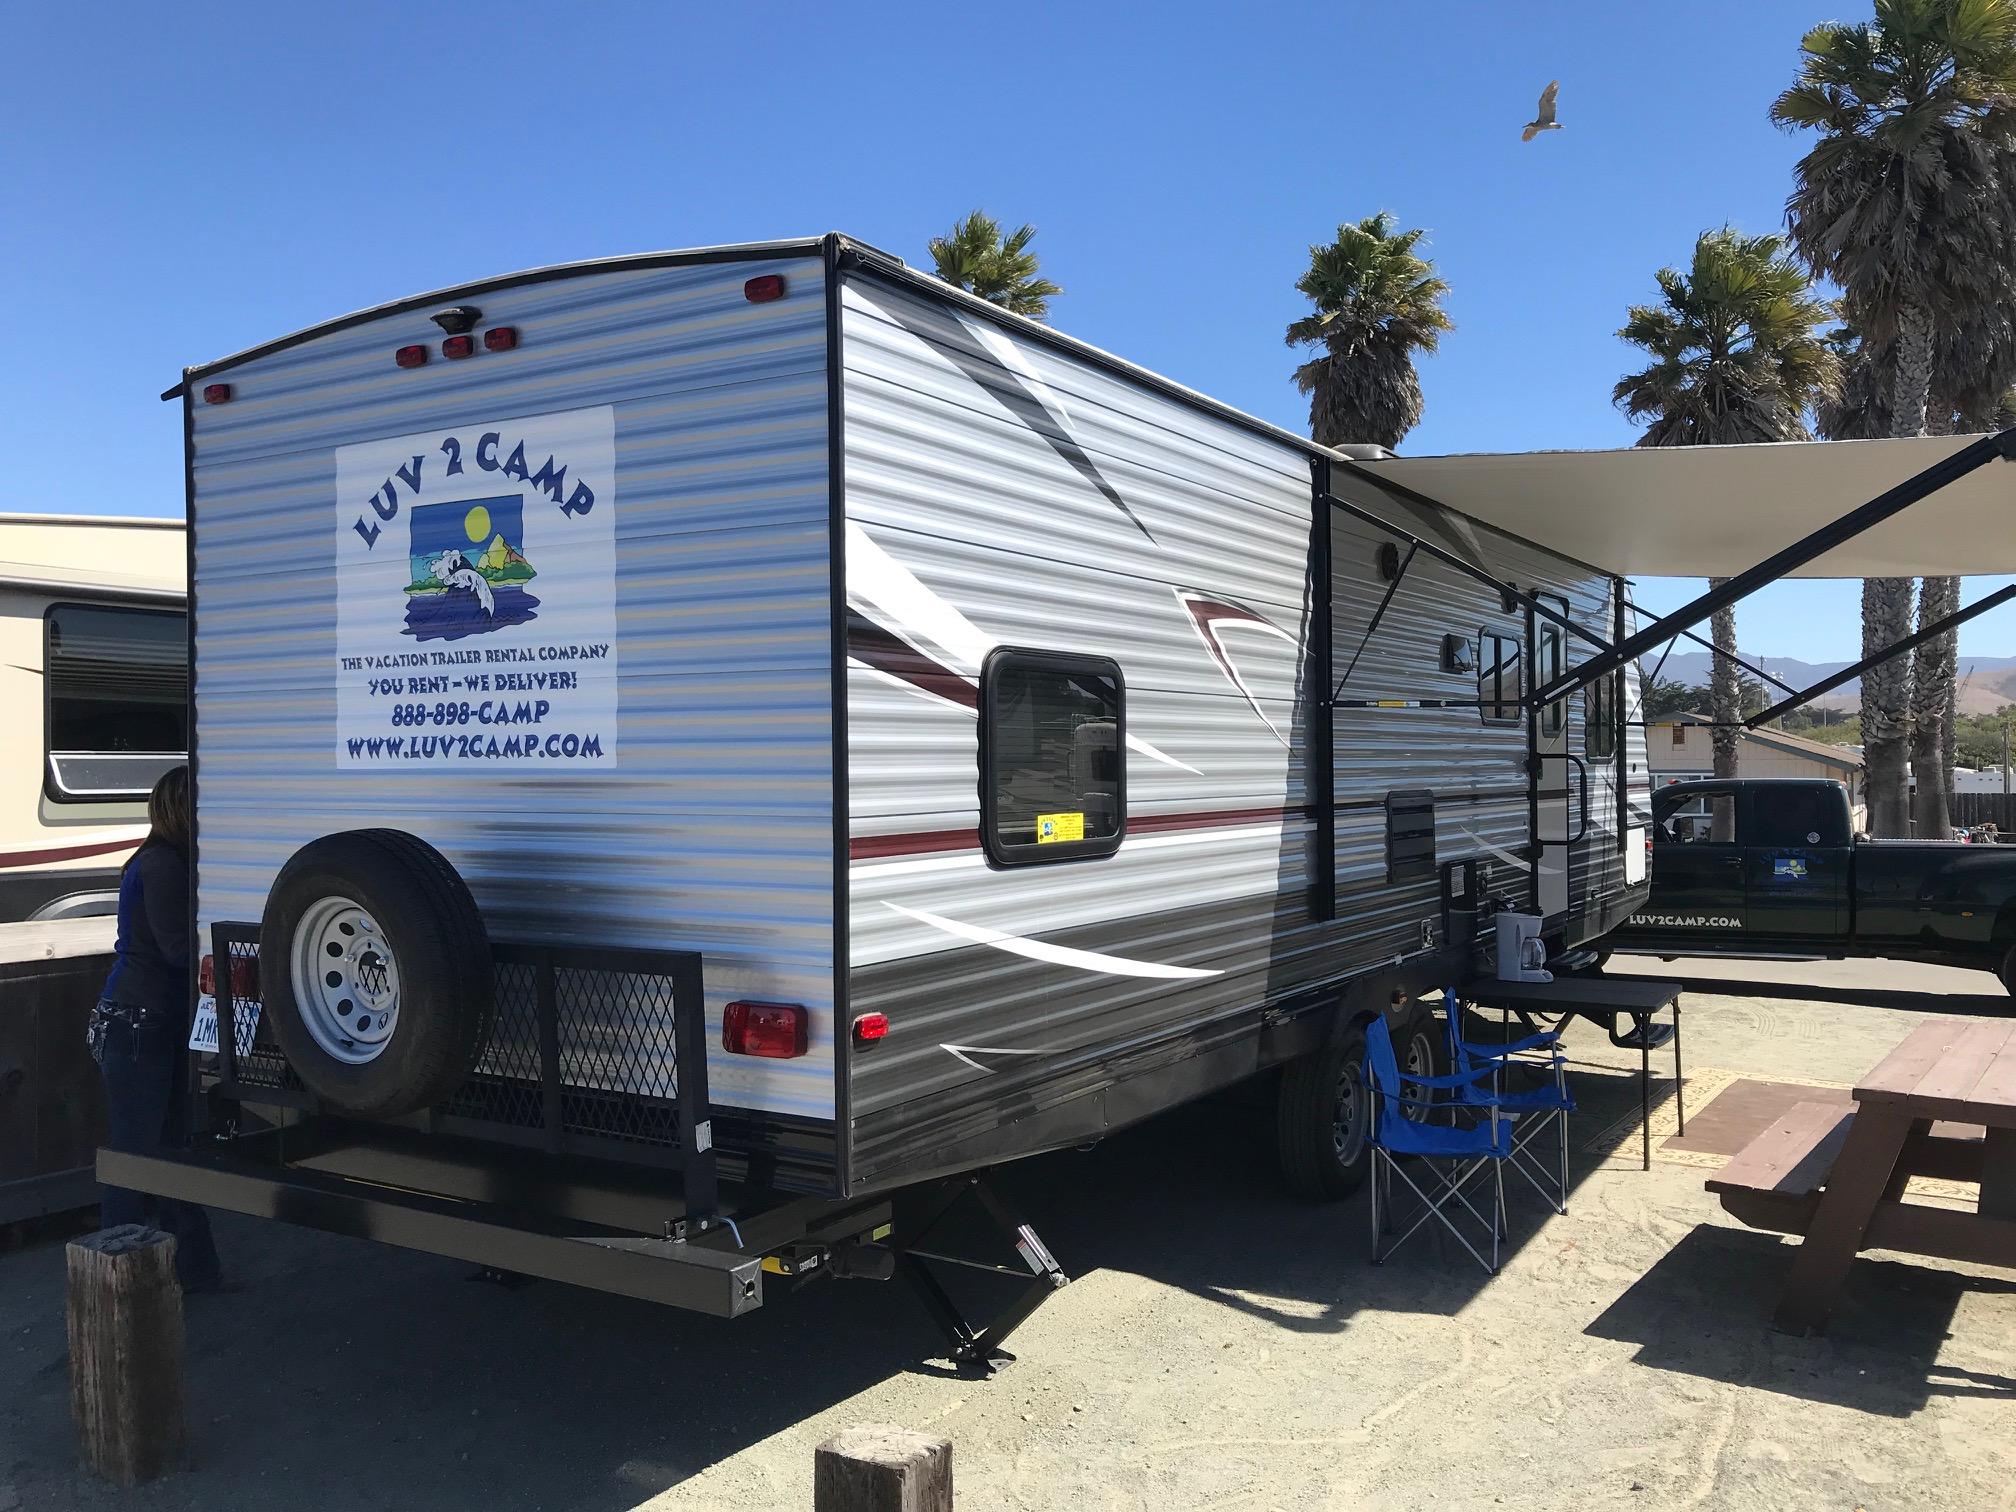 Luv 2 Camp San Simeon - Morro Bay RV trailer rentals